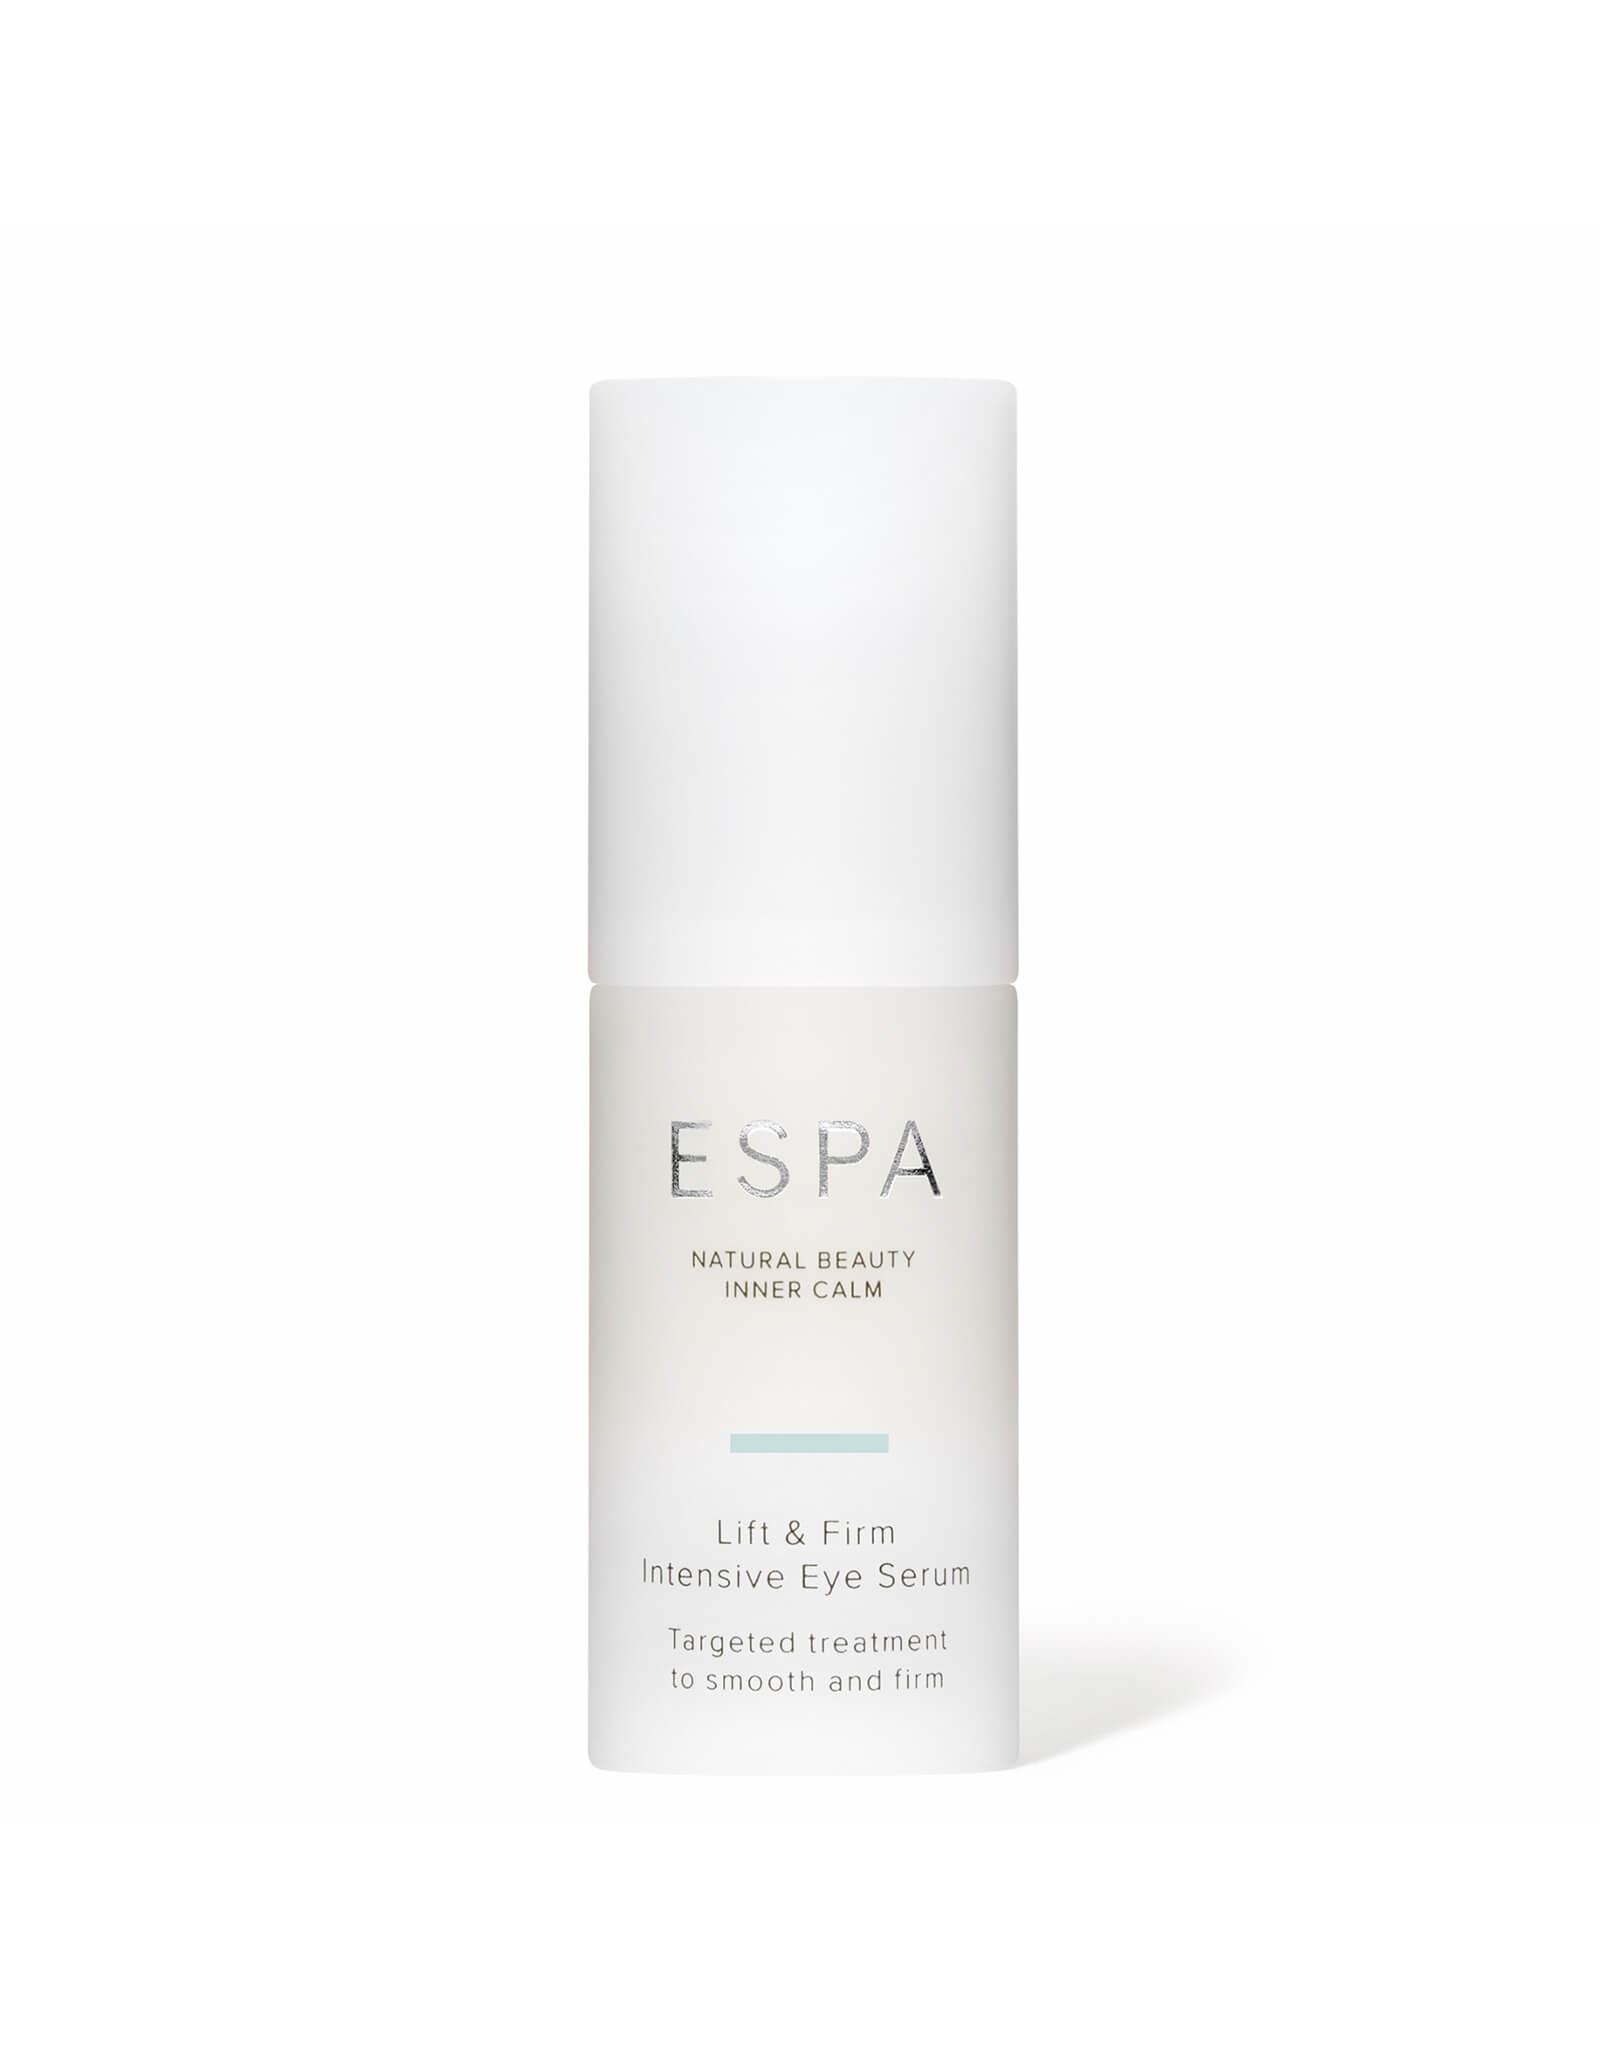 ESPA Lift & Firm Eye Serum